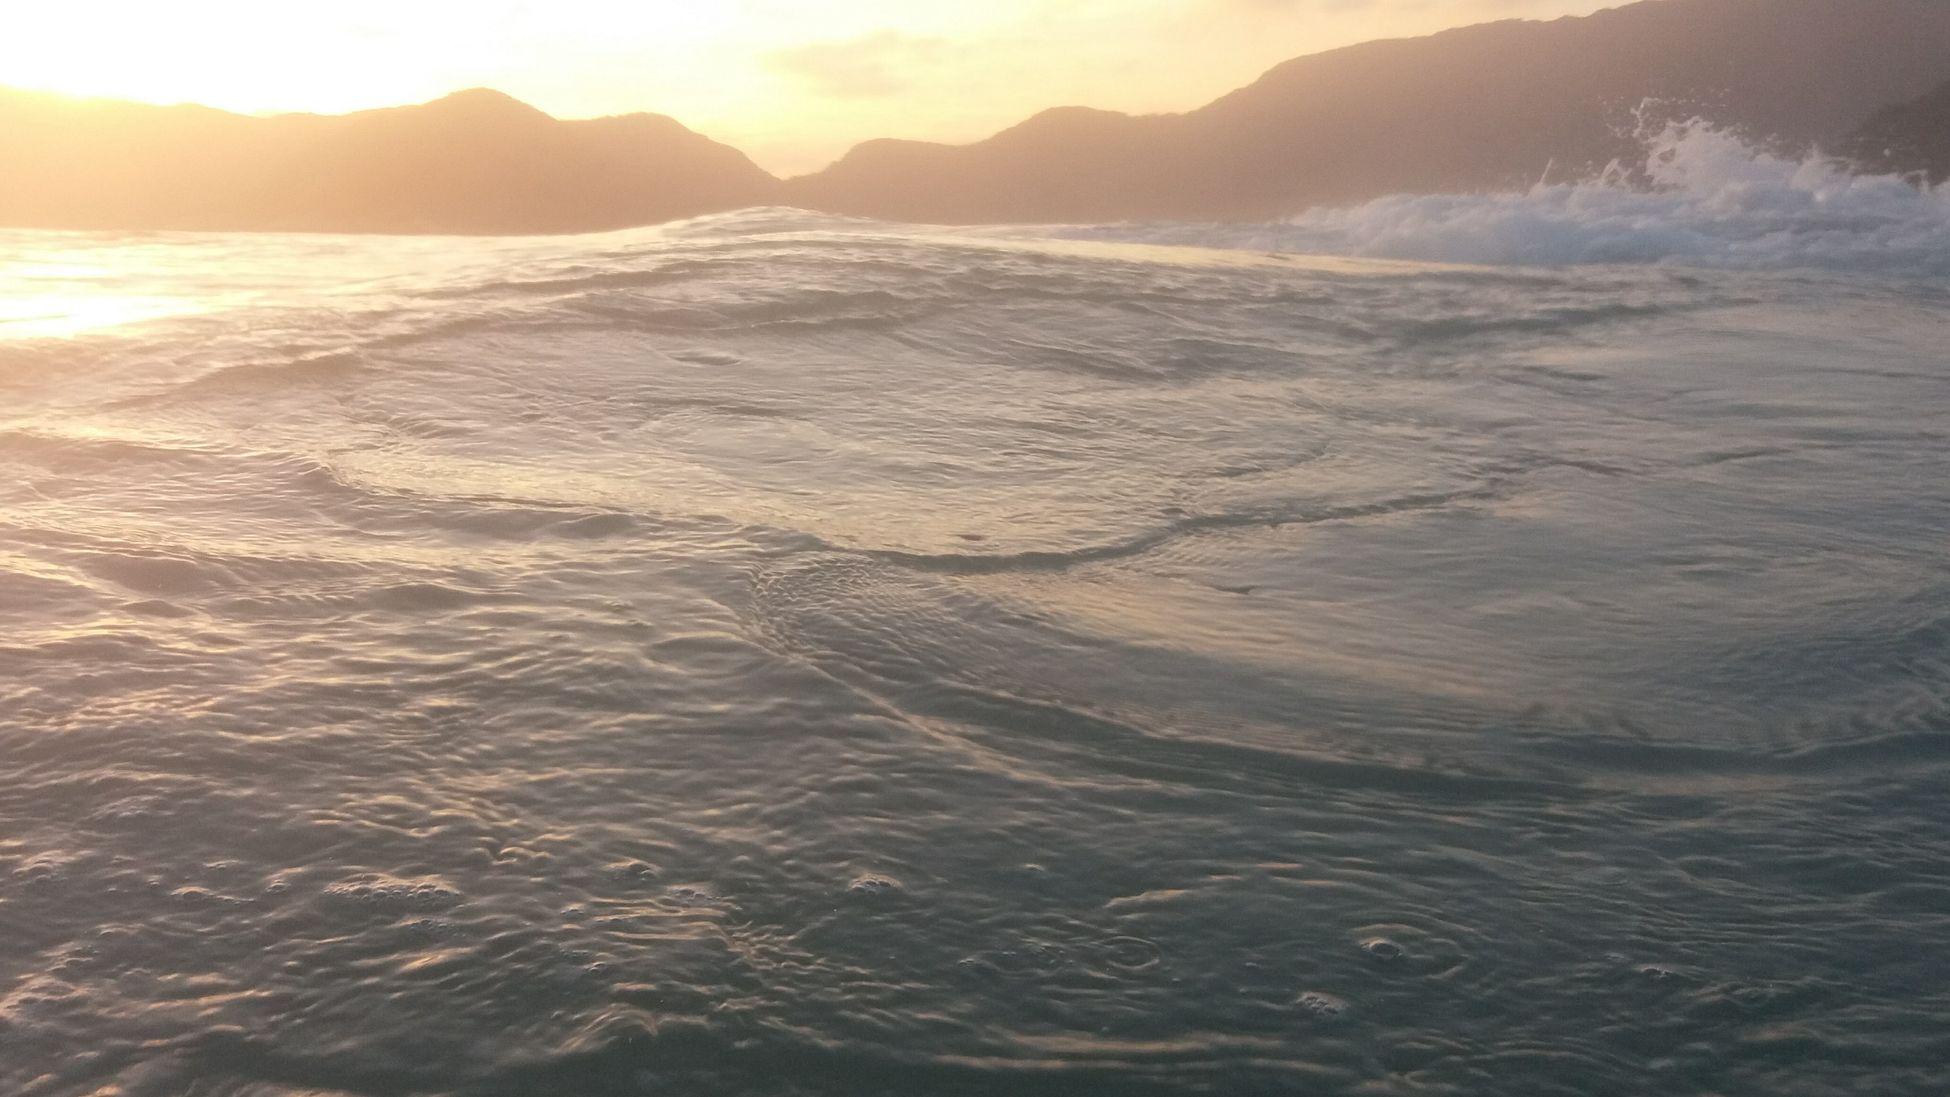 Mar Beach Photography Beach And Montain Beach And Sky Sea Beauty In Nature Brazil Illuminated Reflection Beachphotography The City Light O Rio De Janeiro Continua Lindo 🎶 Rio De Janeiro Eyeem Fotos Collection⛵ Water Wave Sunset Sunlight Flying High